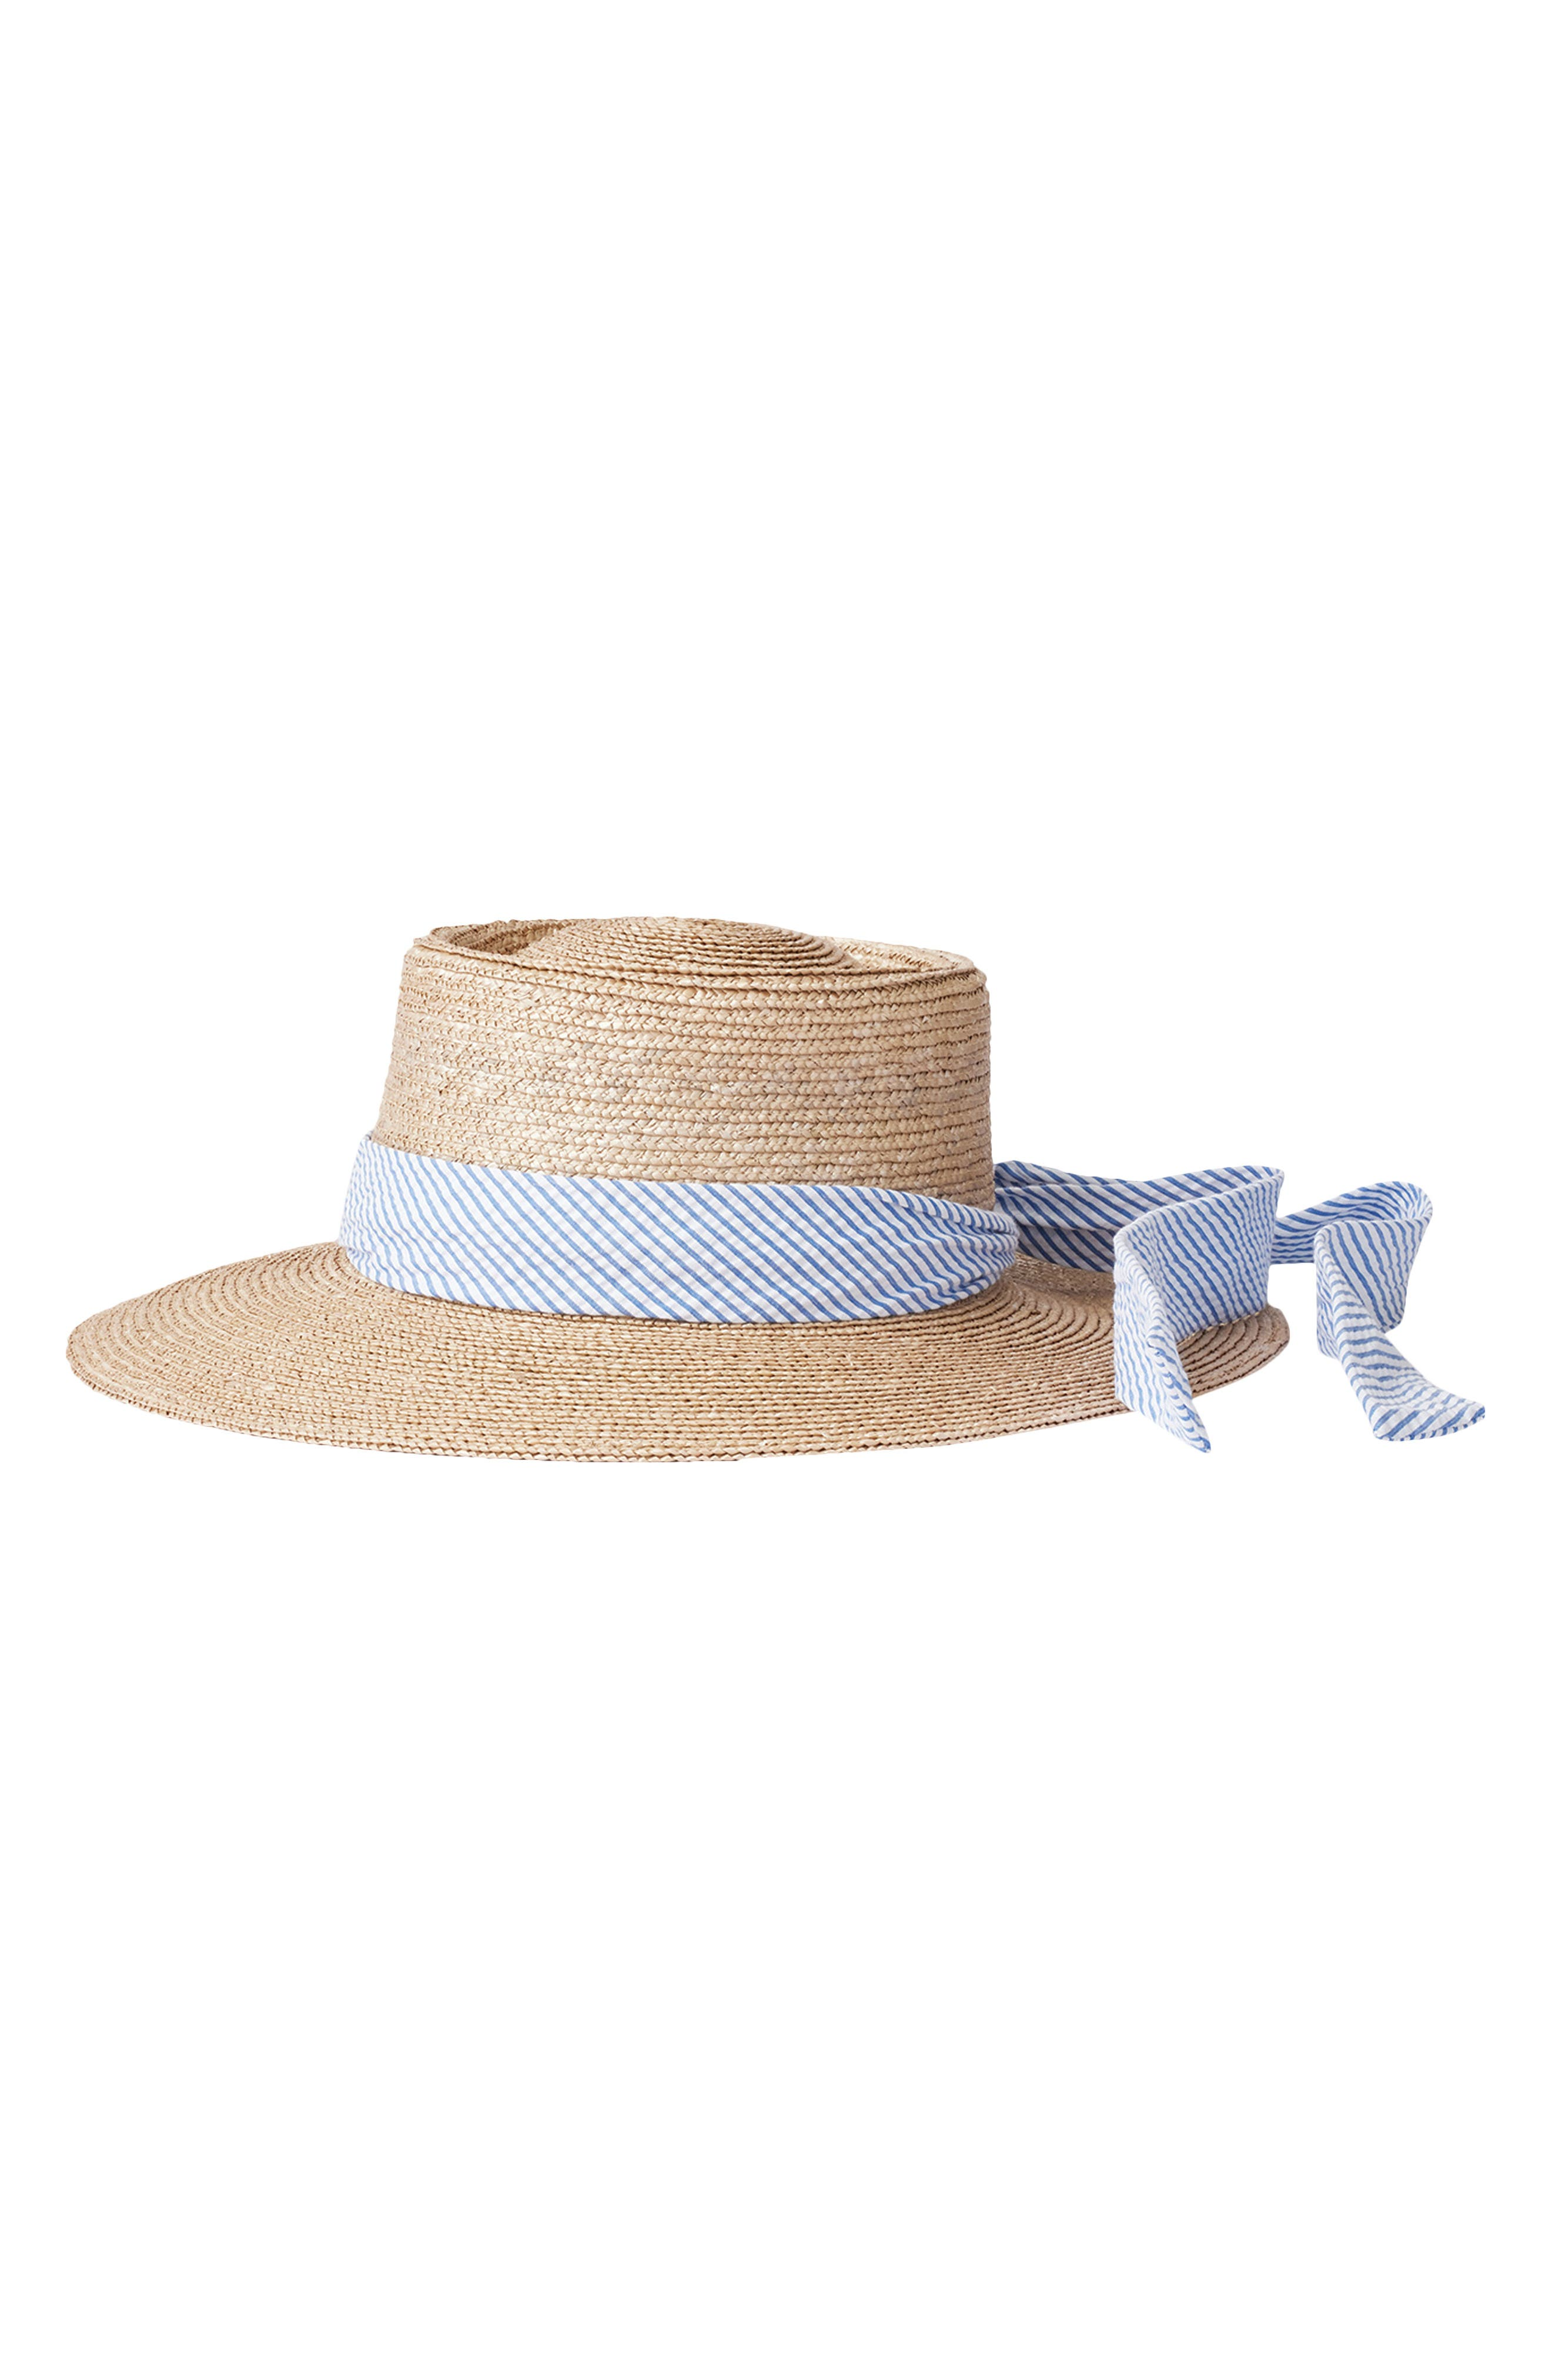 Aries Straw Sun Hat